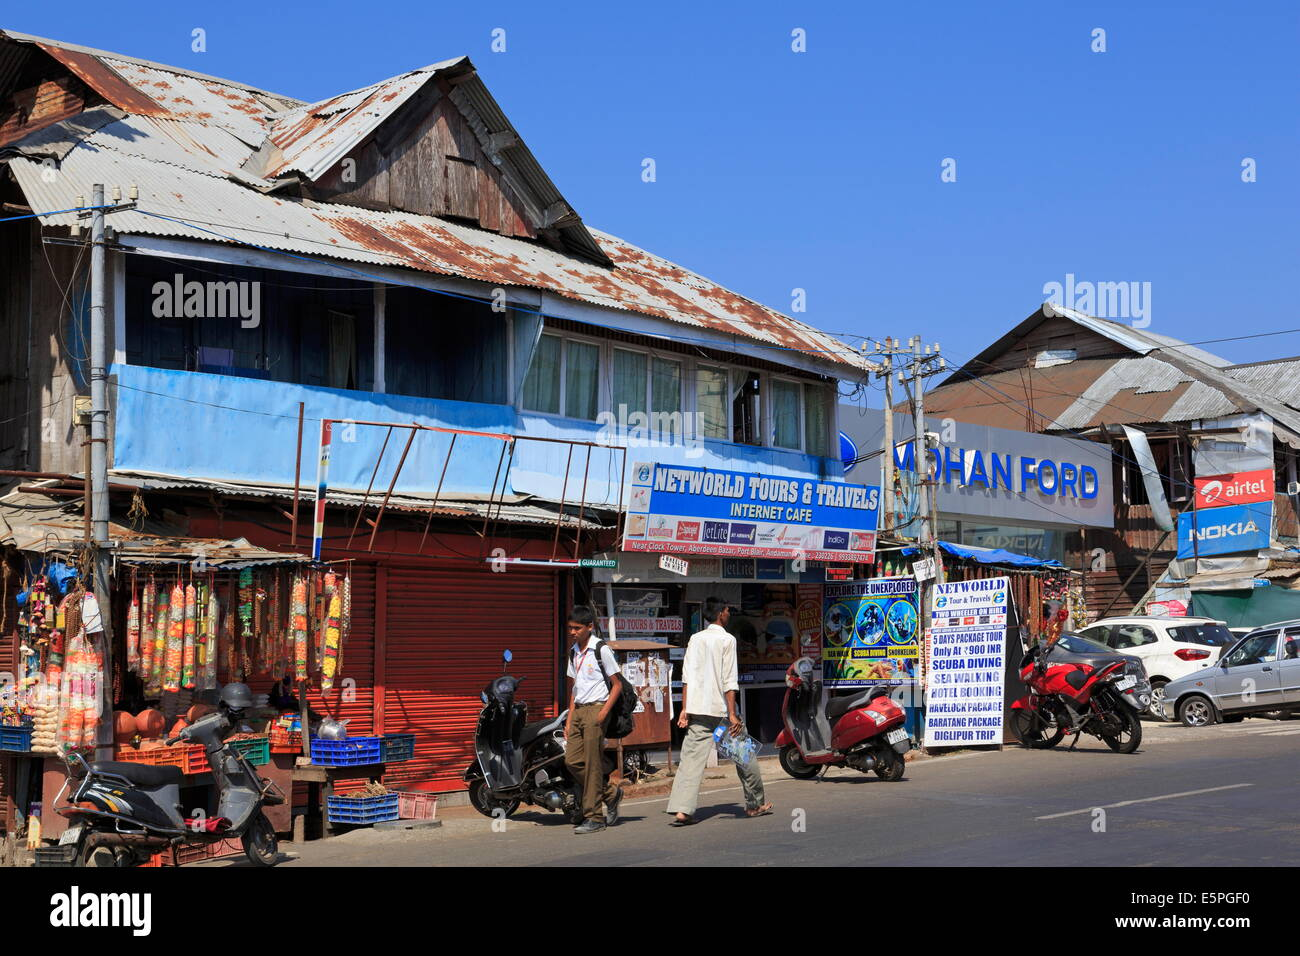 Aberdeen Bazaar, Port Blair, Andaman Islands, India, Asia - Stock Image